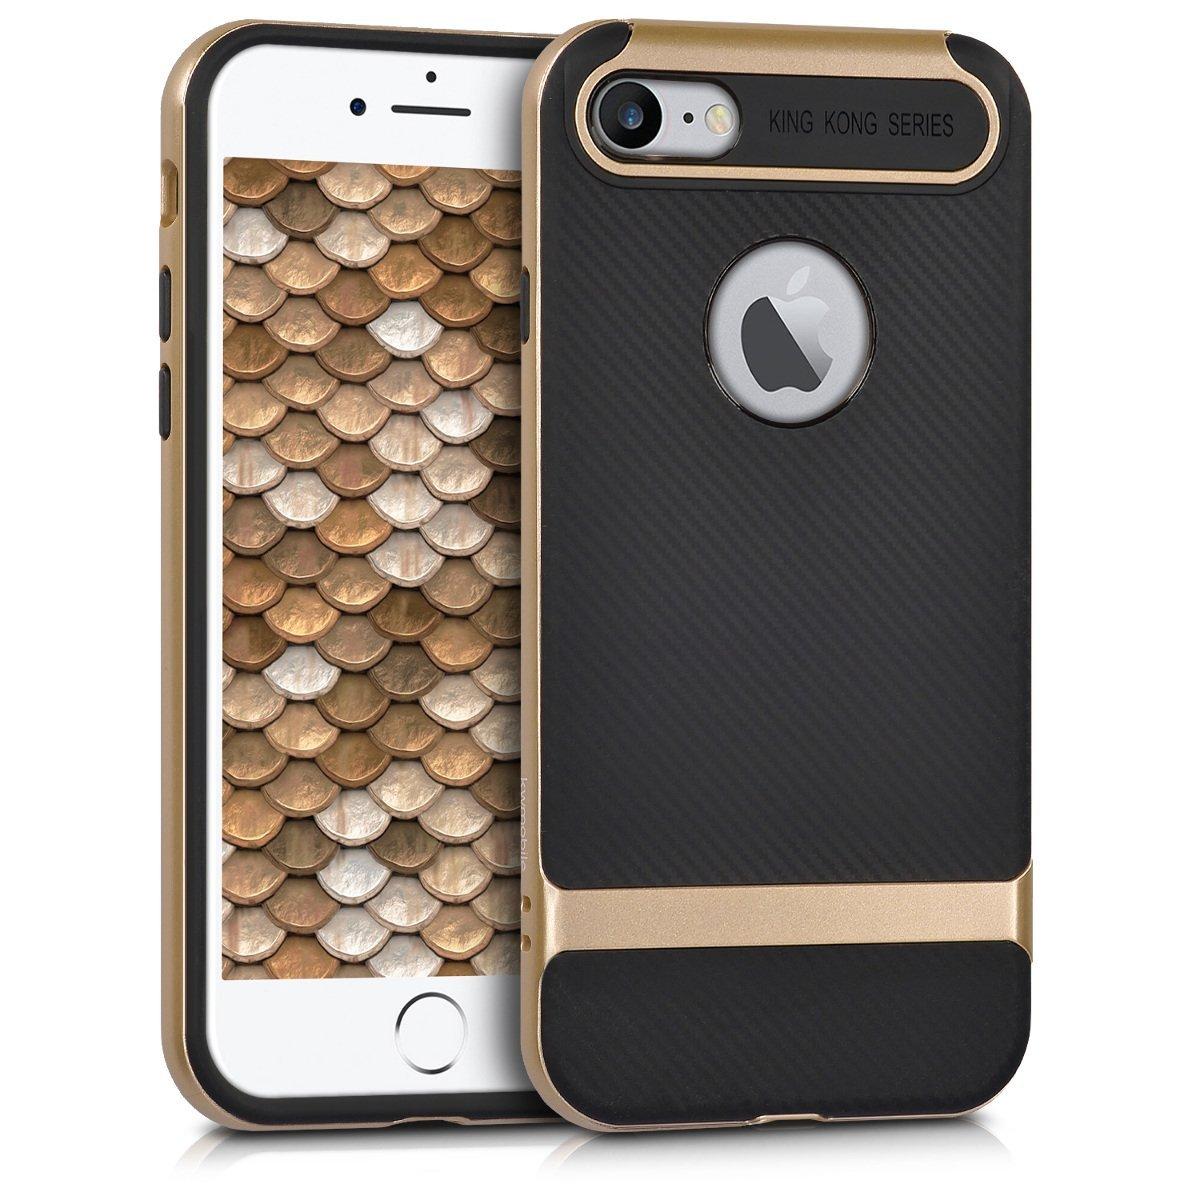 KW Hybrid Θήκη Σιλικόνης iPhone 7 - Metallic Gold/Black (40481.66)